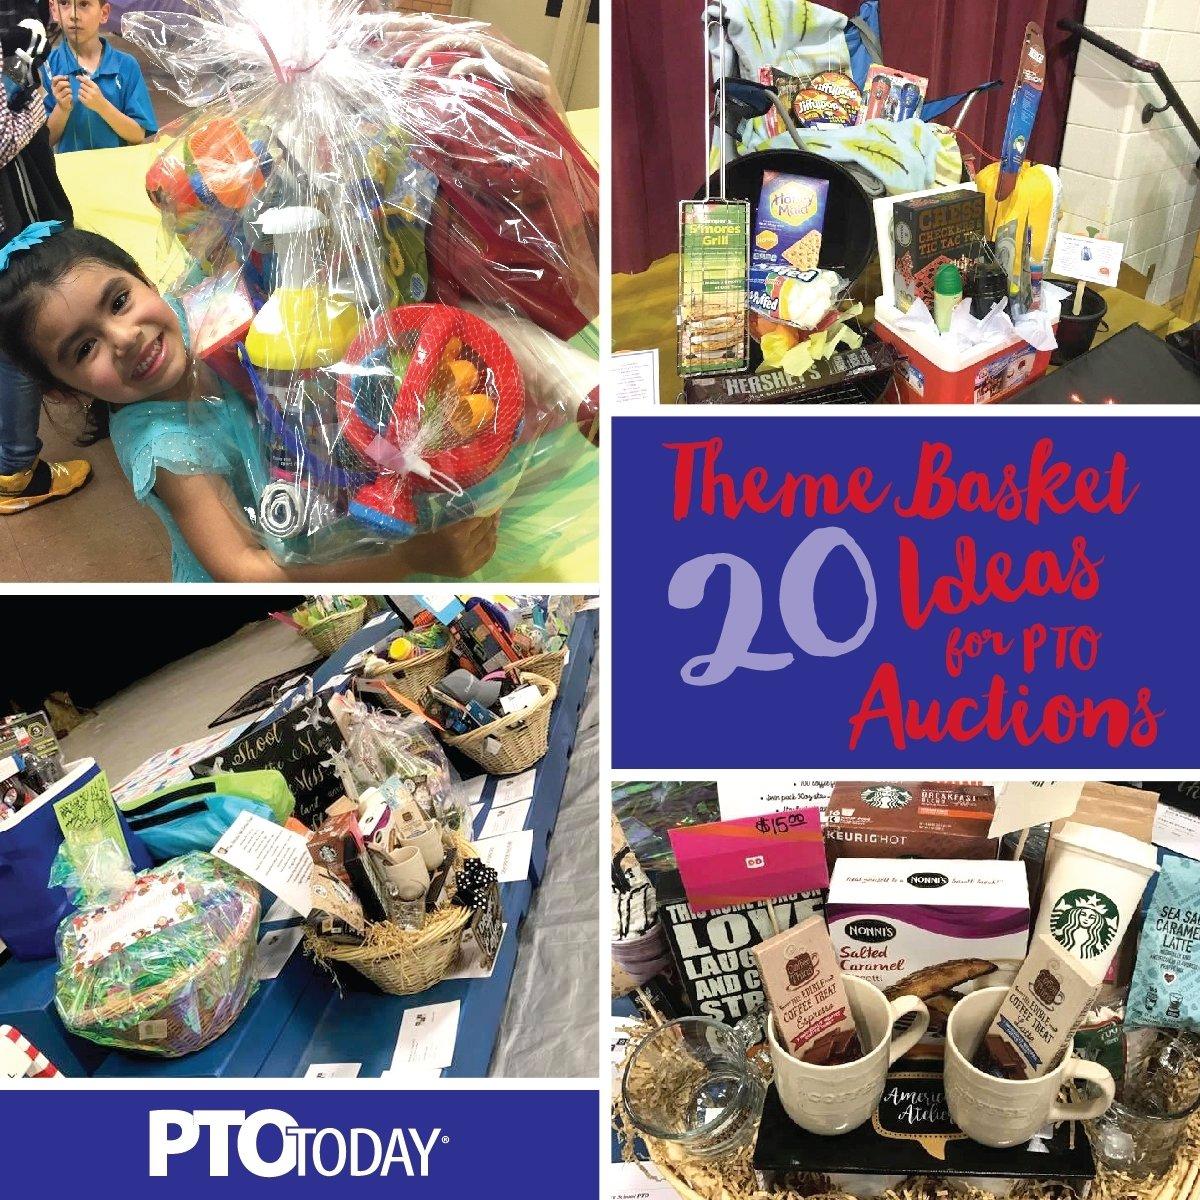 10 Cute Theme Basket Ideas For Silent Auction 20 ideas for theme baskets for ptos and ptas pto today 3 2020